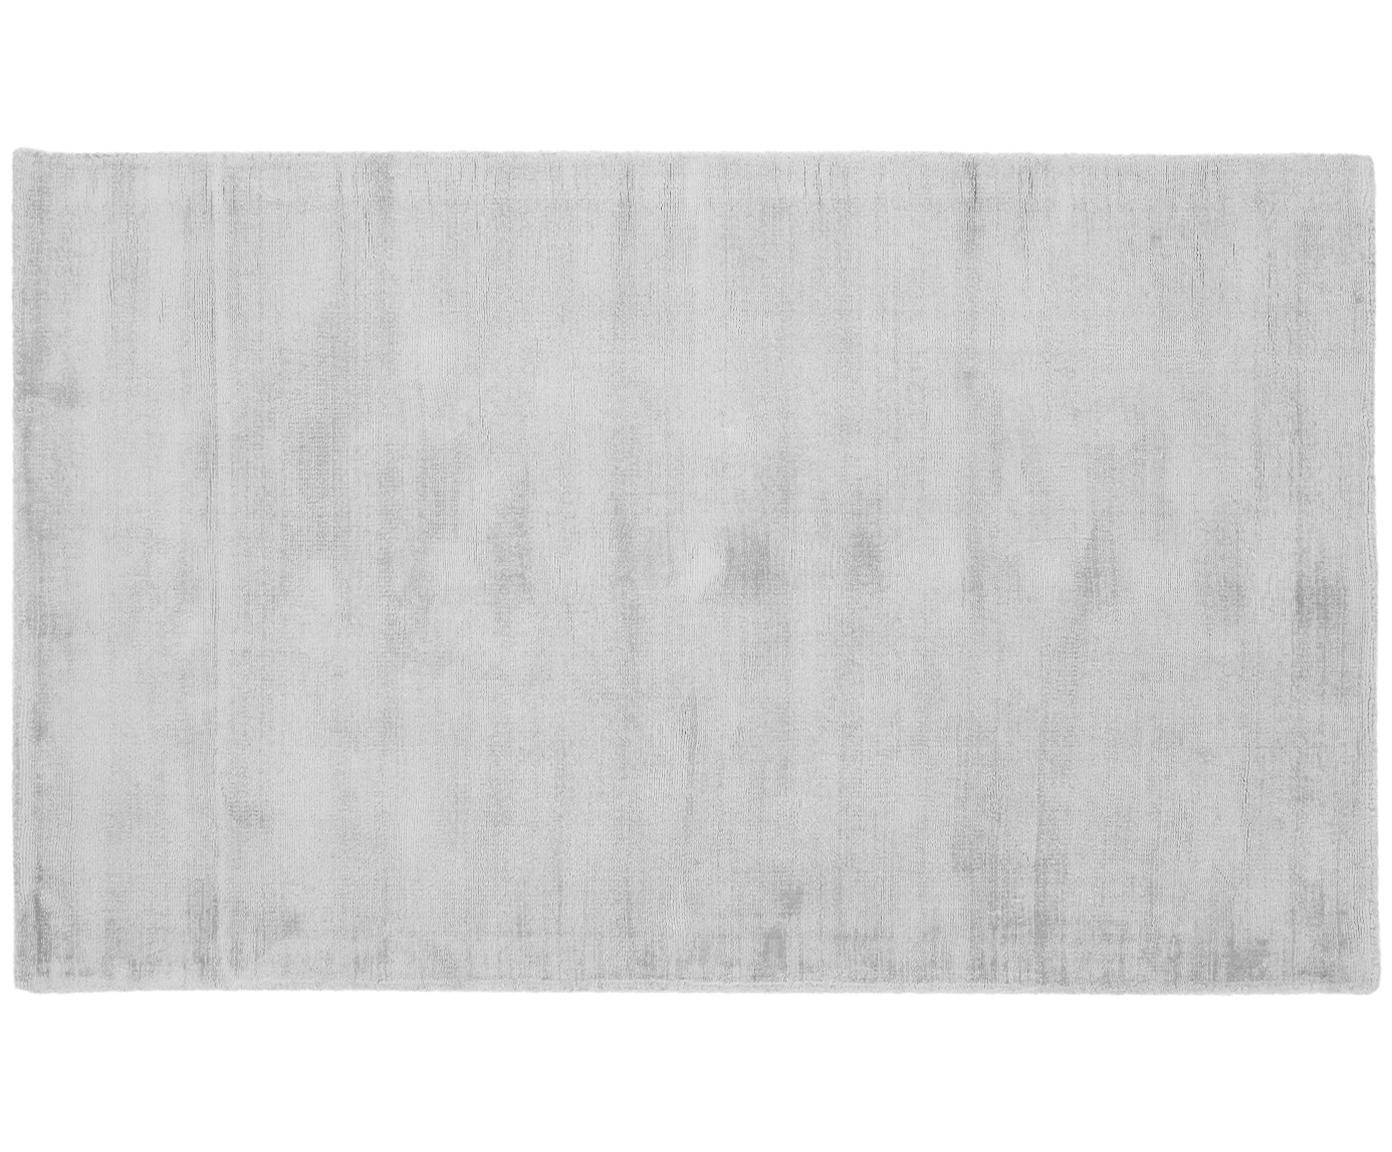 Handgewebter Viskoseteppich Jane in Silbergrau, Flor: 100% Viskose, Silbergrau, B 90 x L 150 cm (Größe XS)